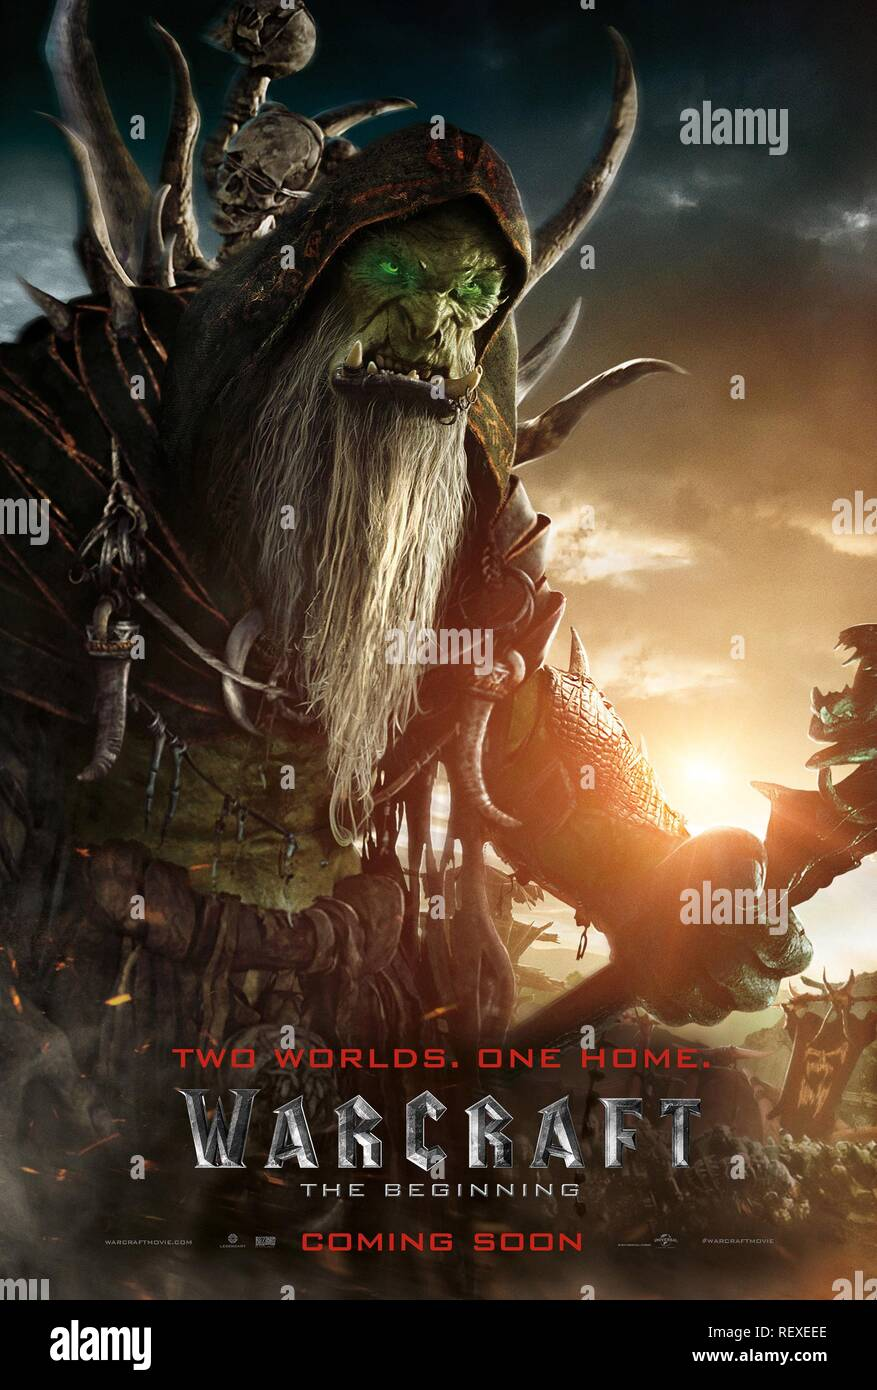 Movie Poster Warcraft 2016 Stock Photo Alamy